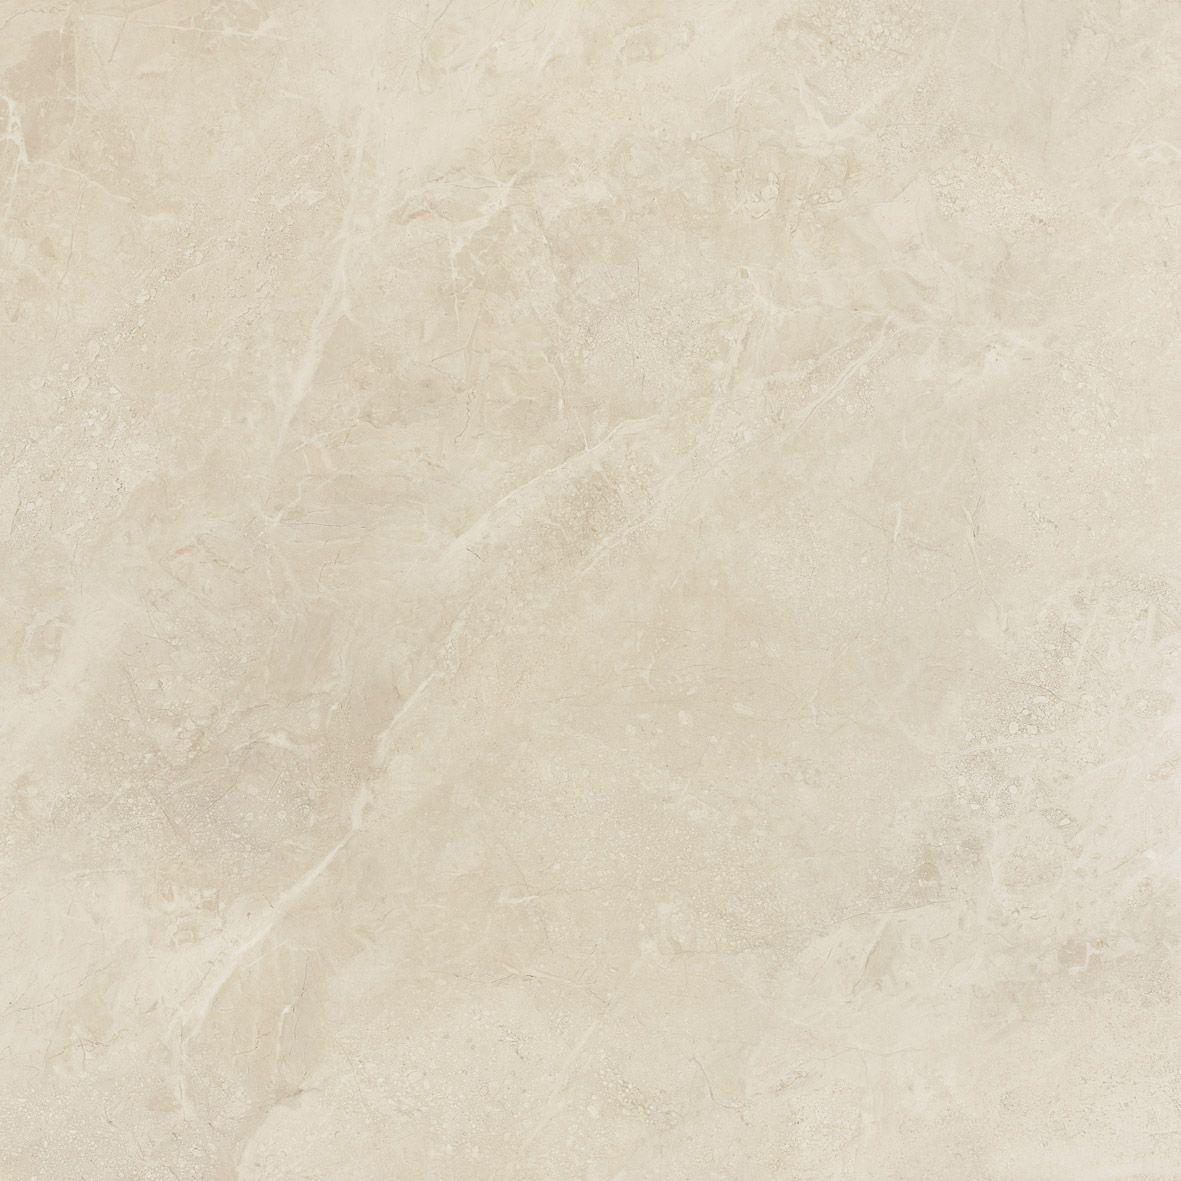 Beige 40x40 90x90cm Porcelain Floor Tile Livingroom Kitchen Lobby Bathroom Porcelain Floor Tiles Grey Flooring Flooring